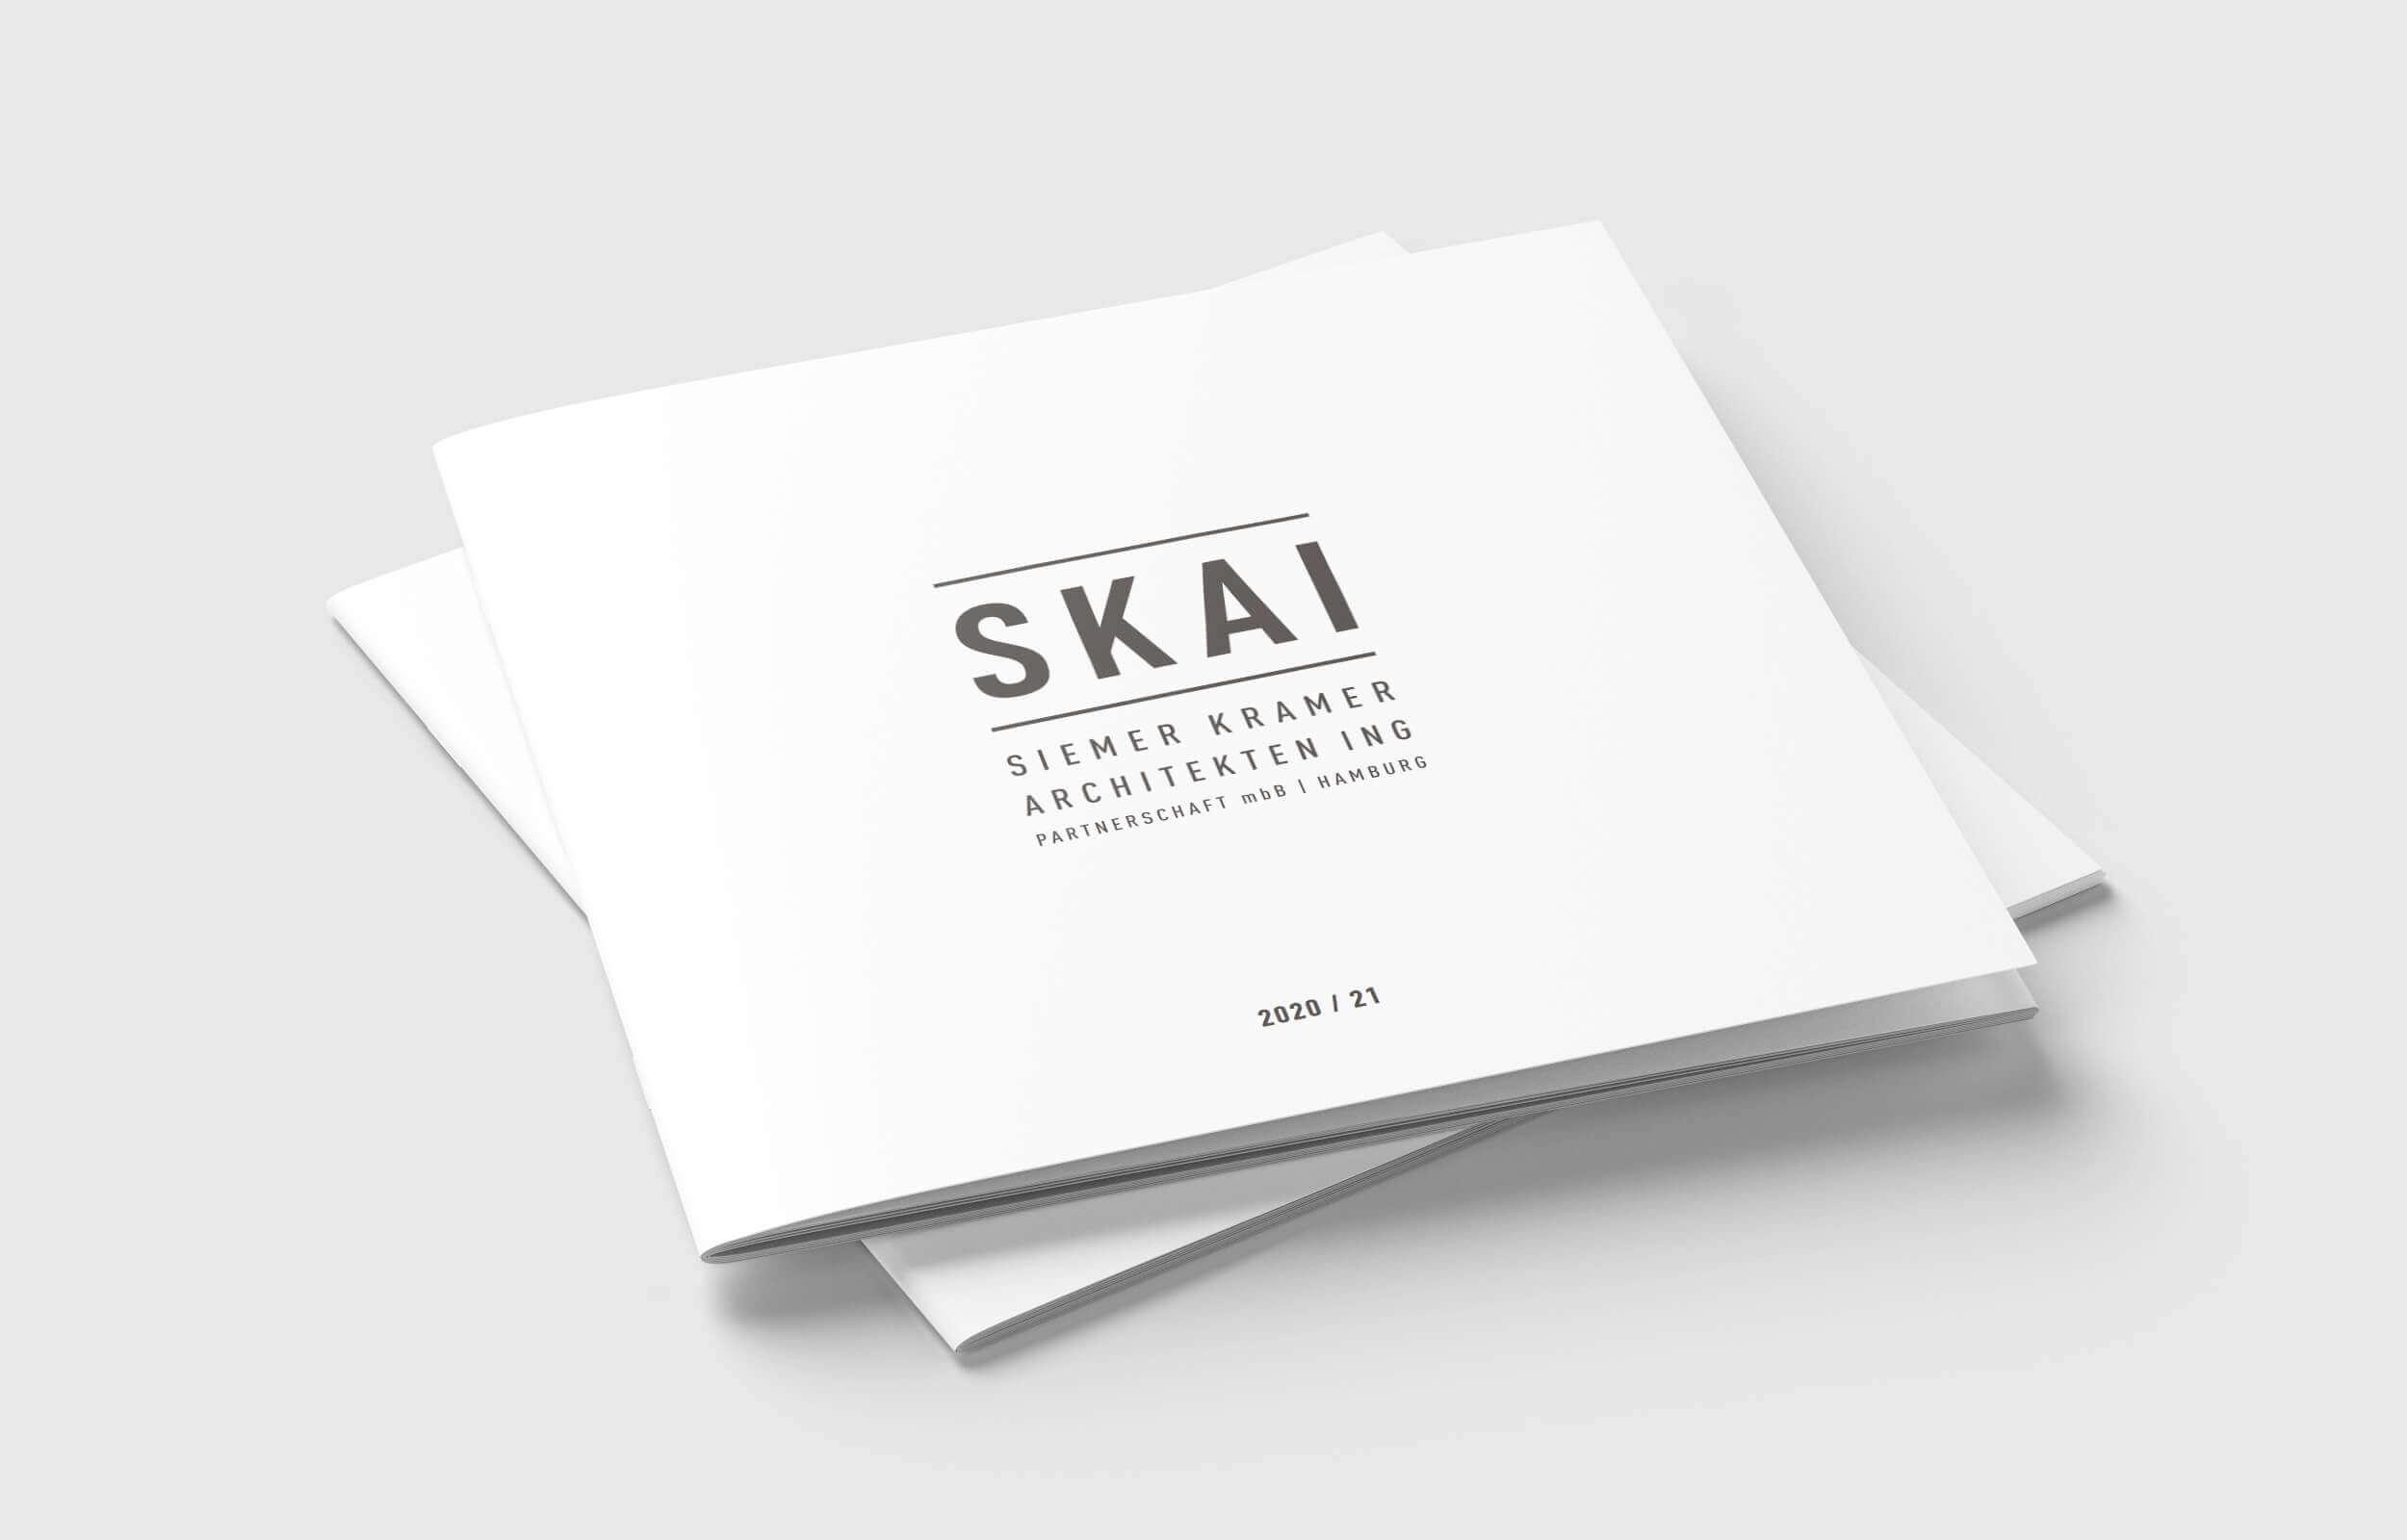 SKAI Image-Book-Cover